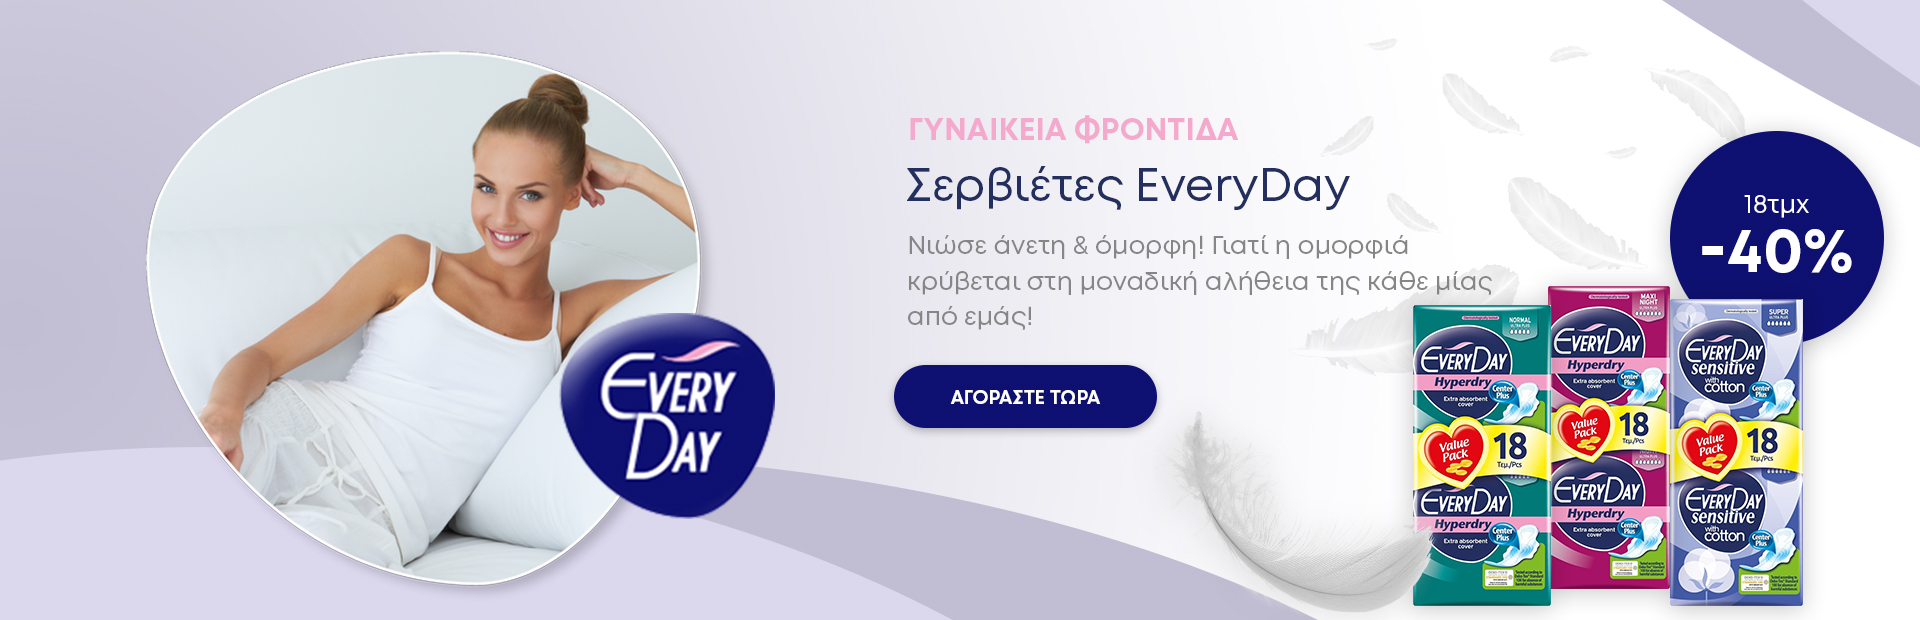 everyday offer